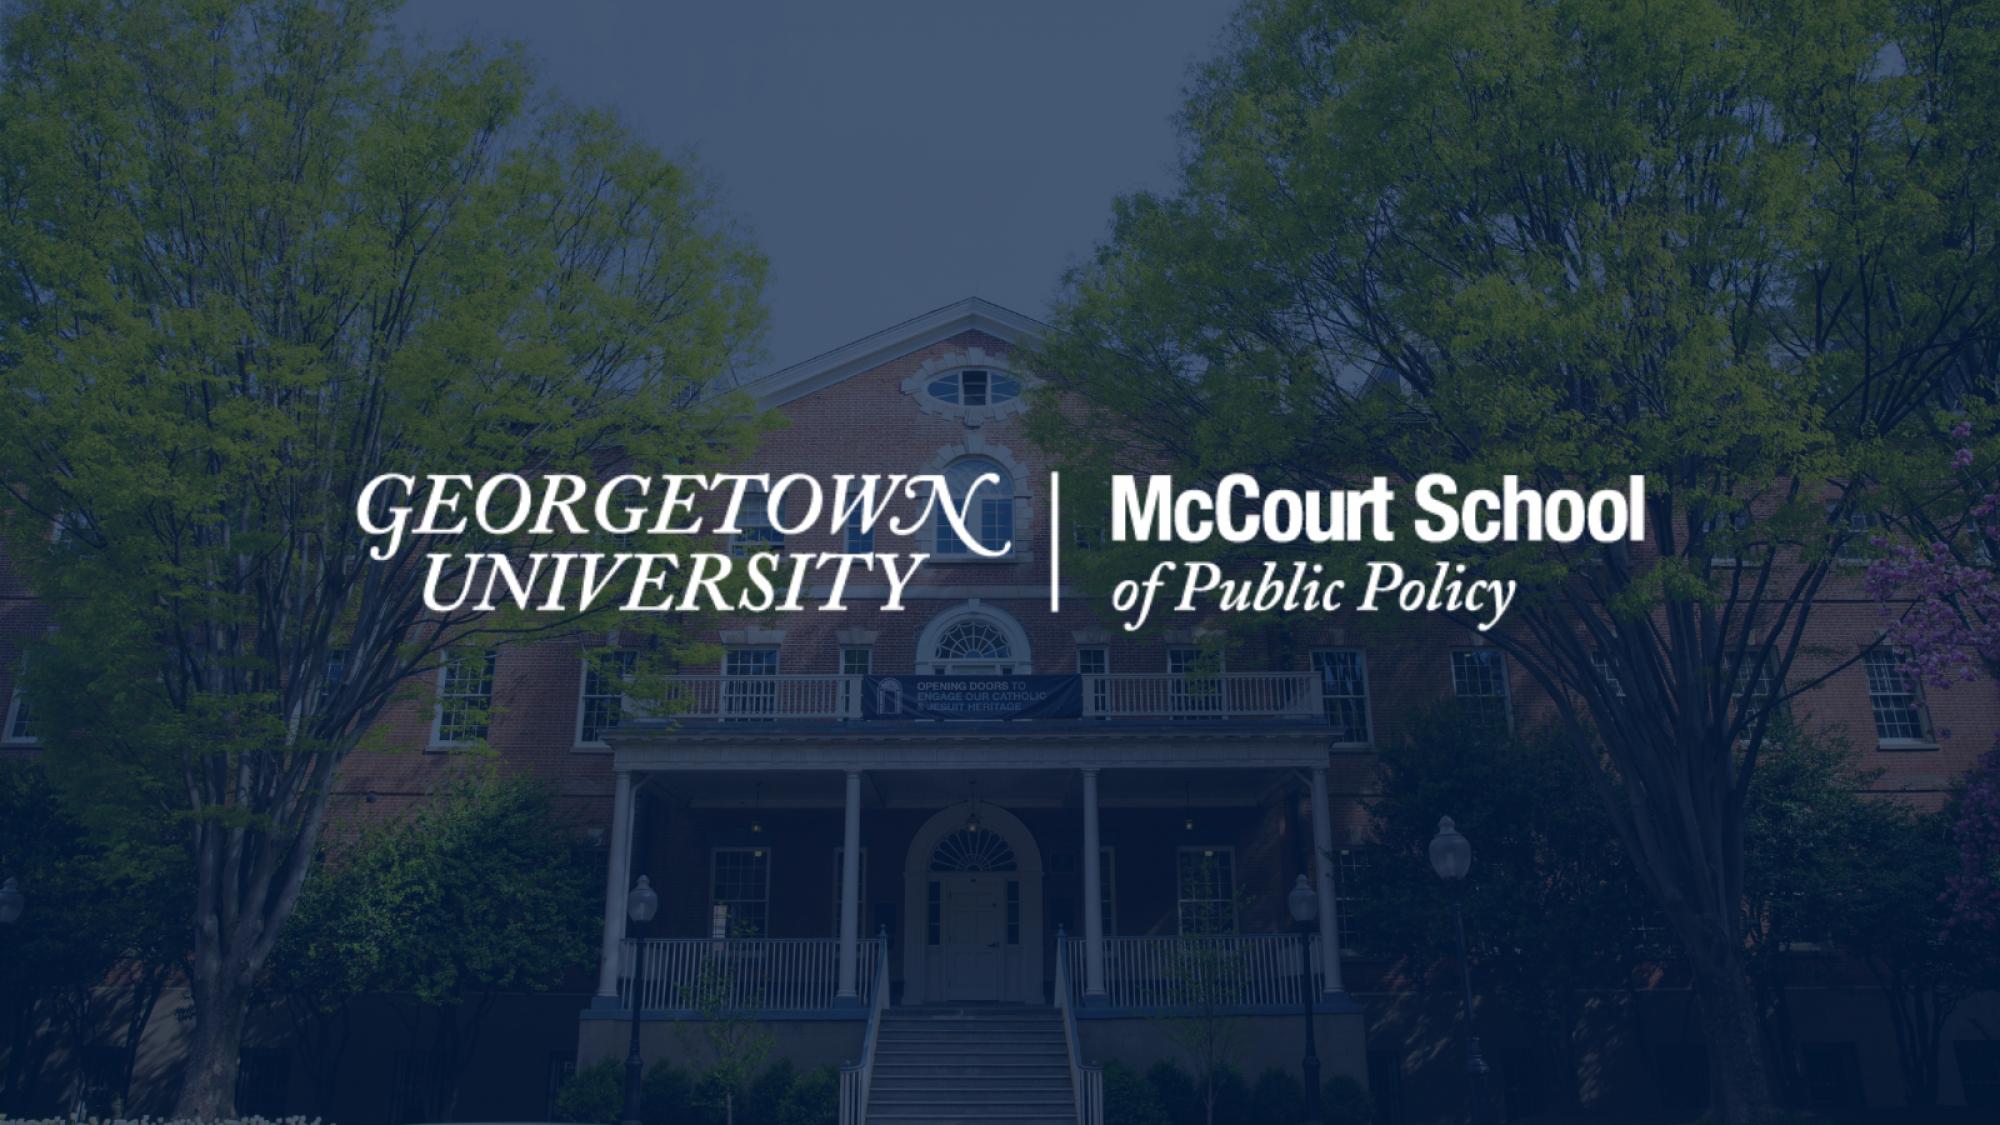 The New McCourt School